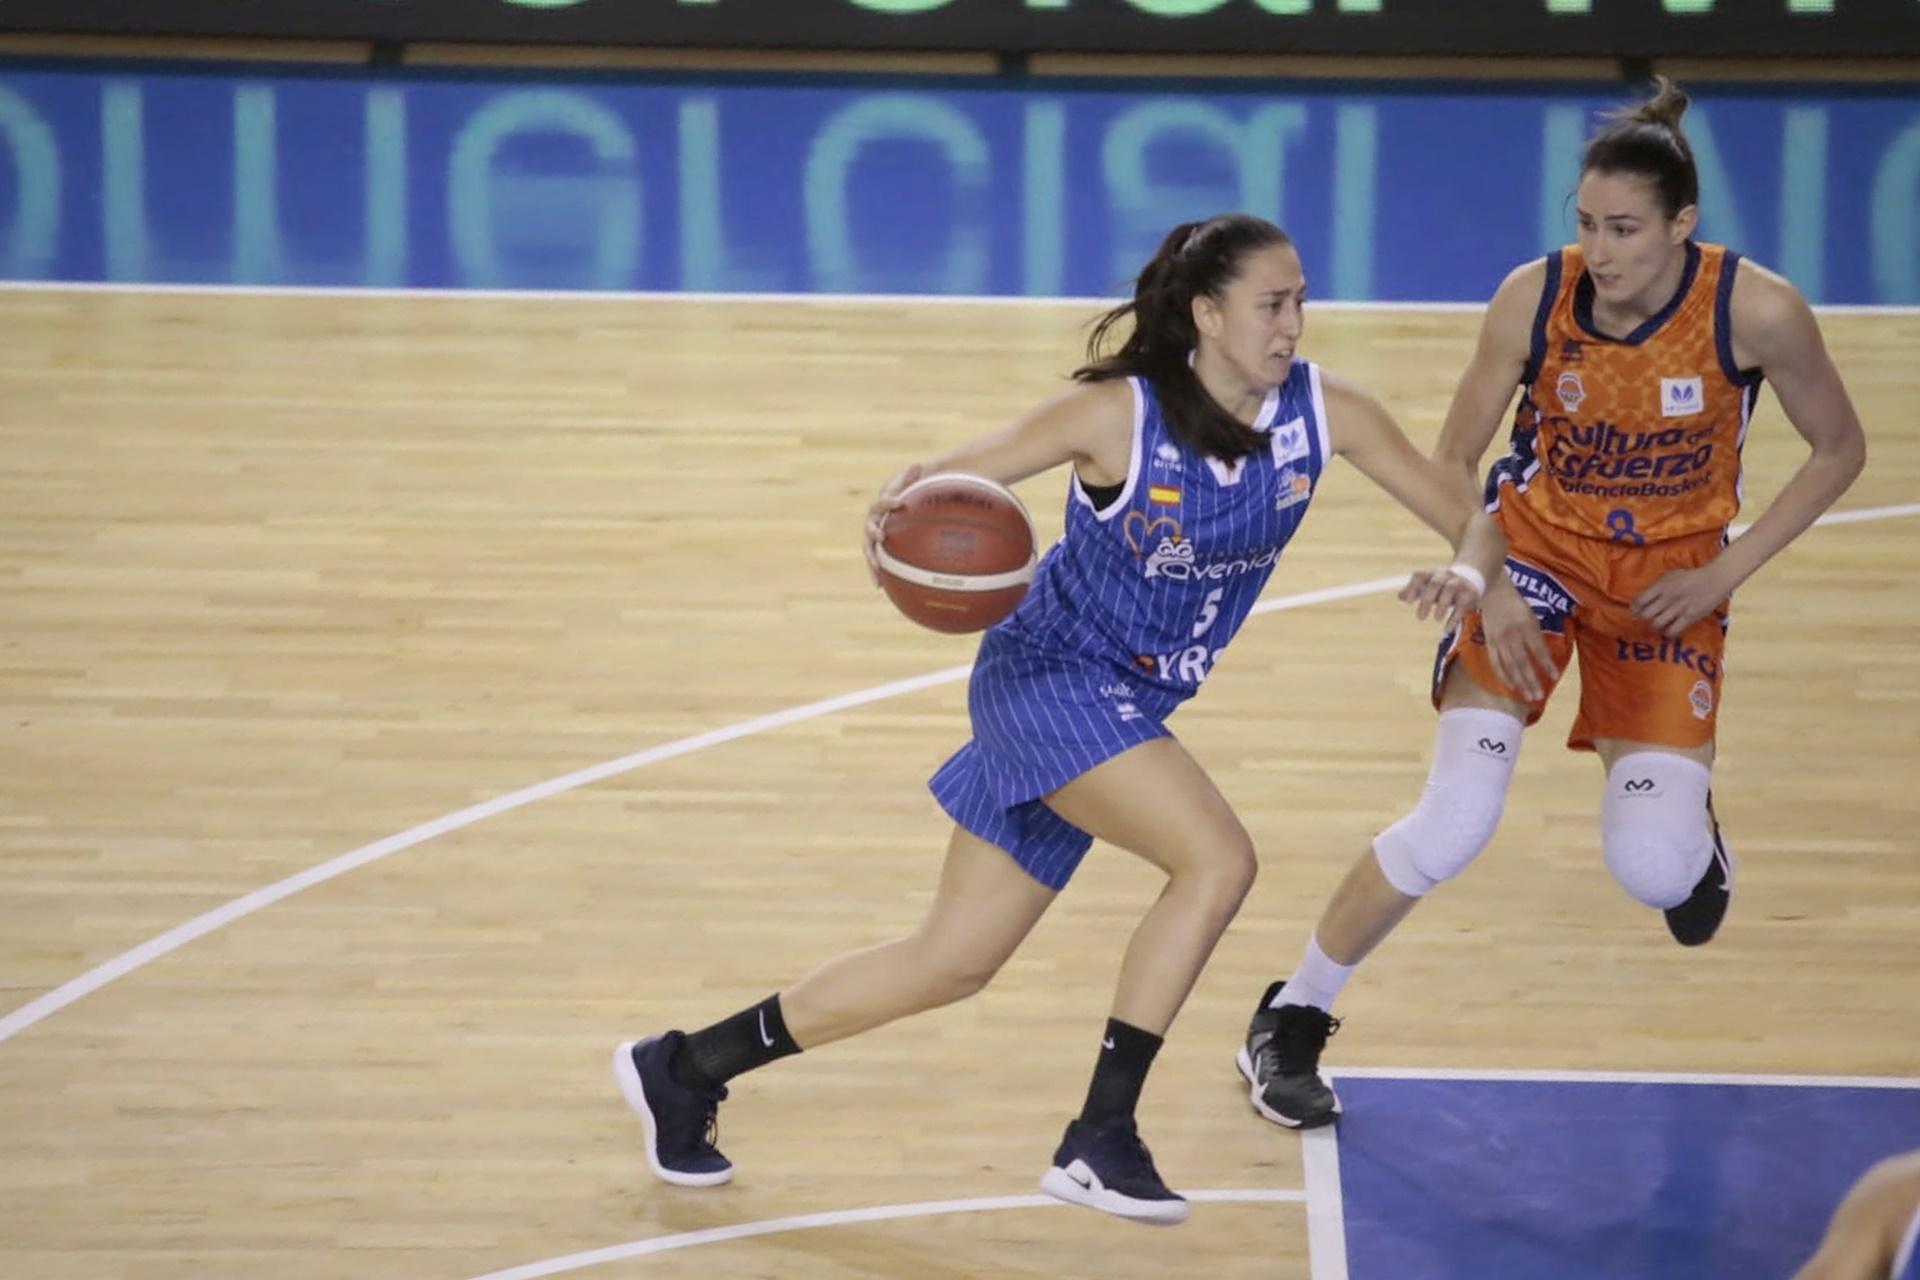 Maite Cazorla destaca en Avenida, que gana a Valencia y queda como único invicto de Liga Femenina